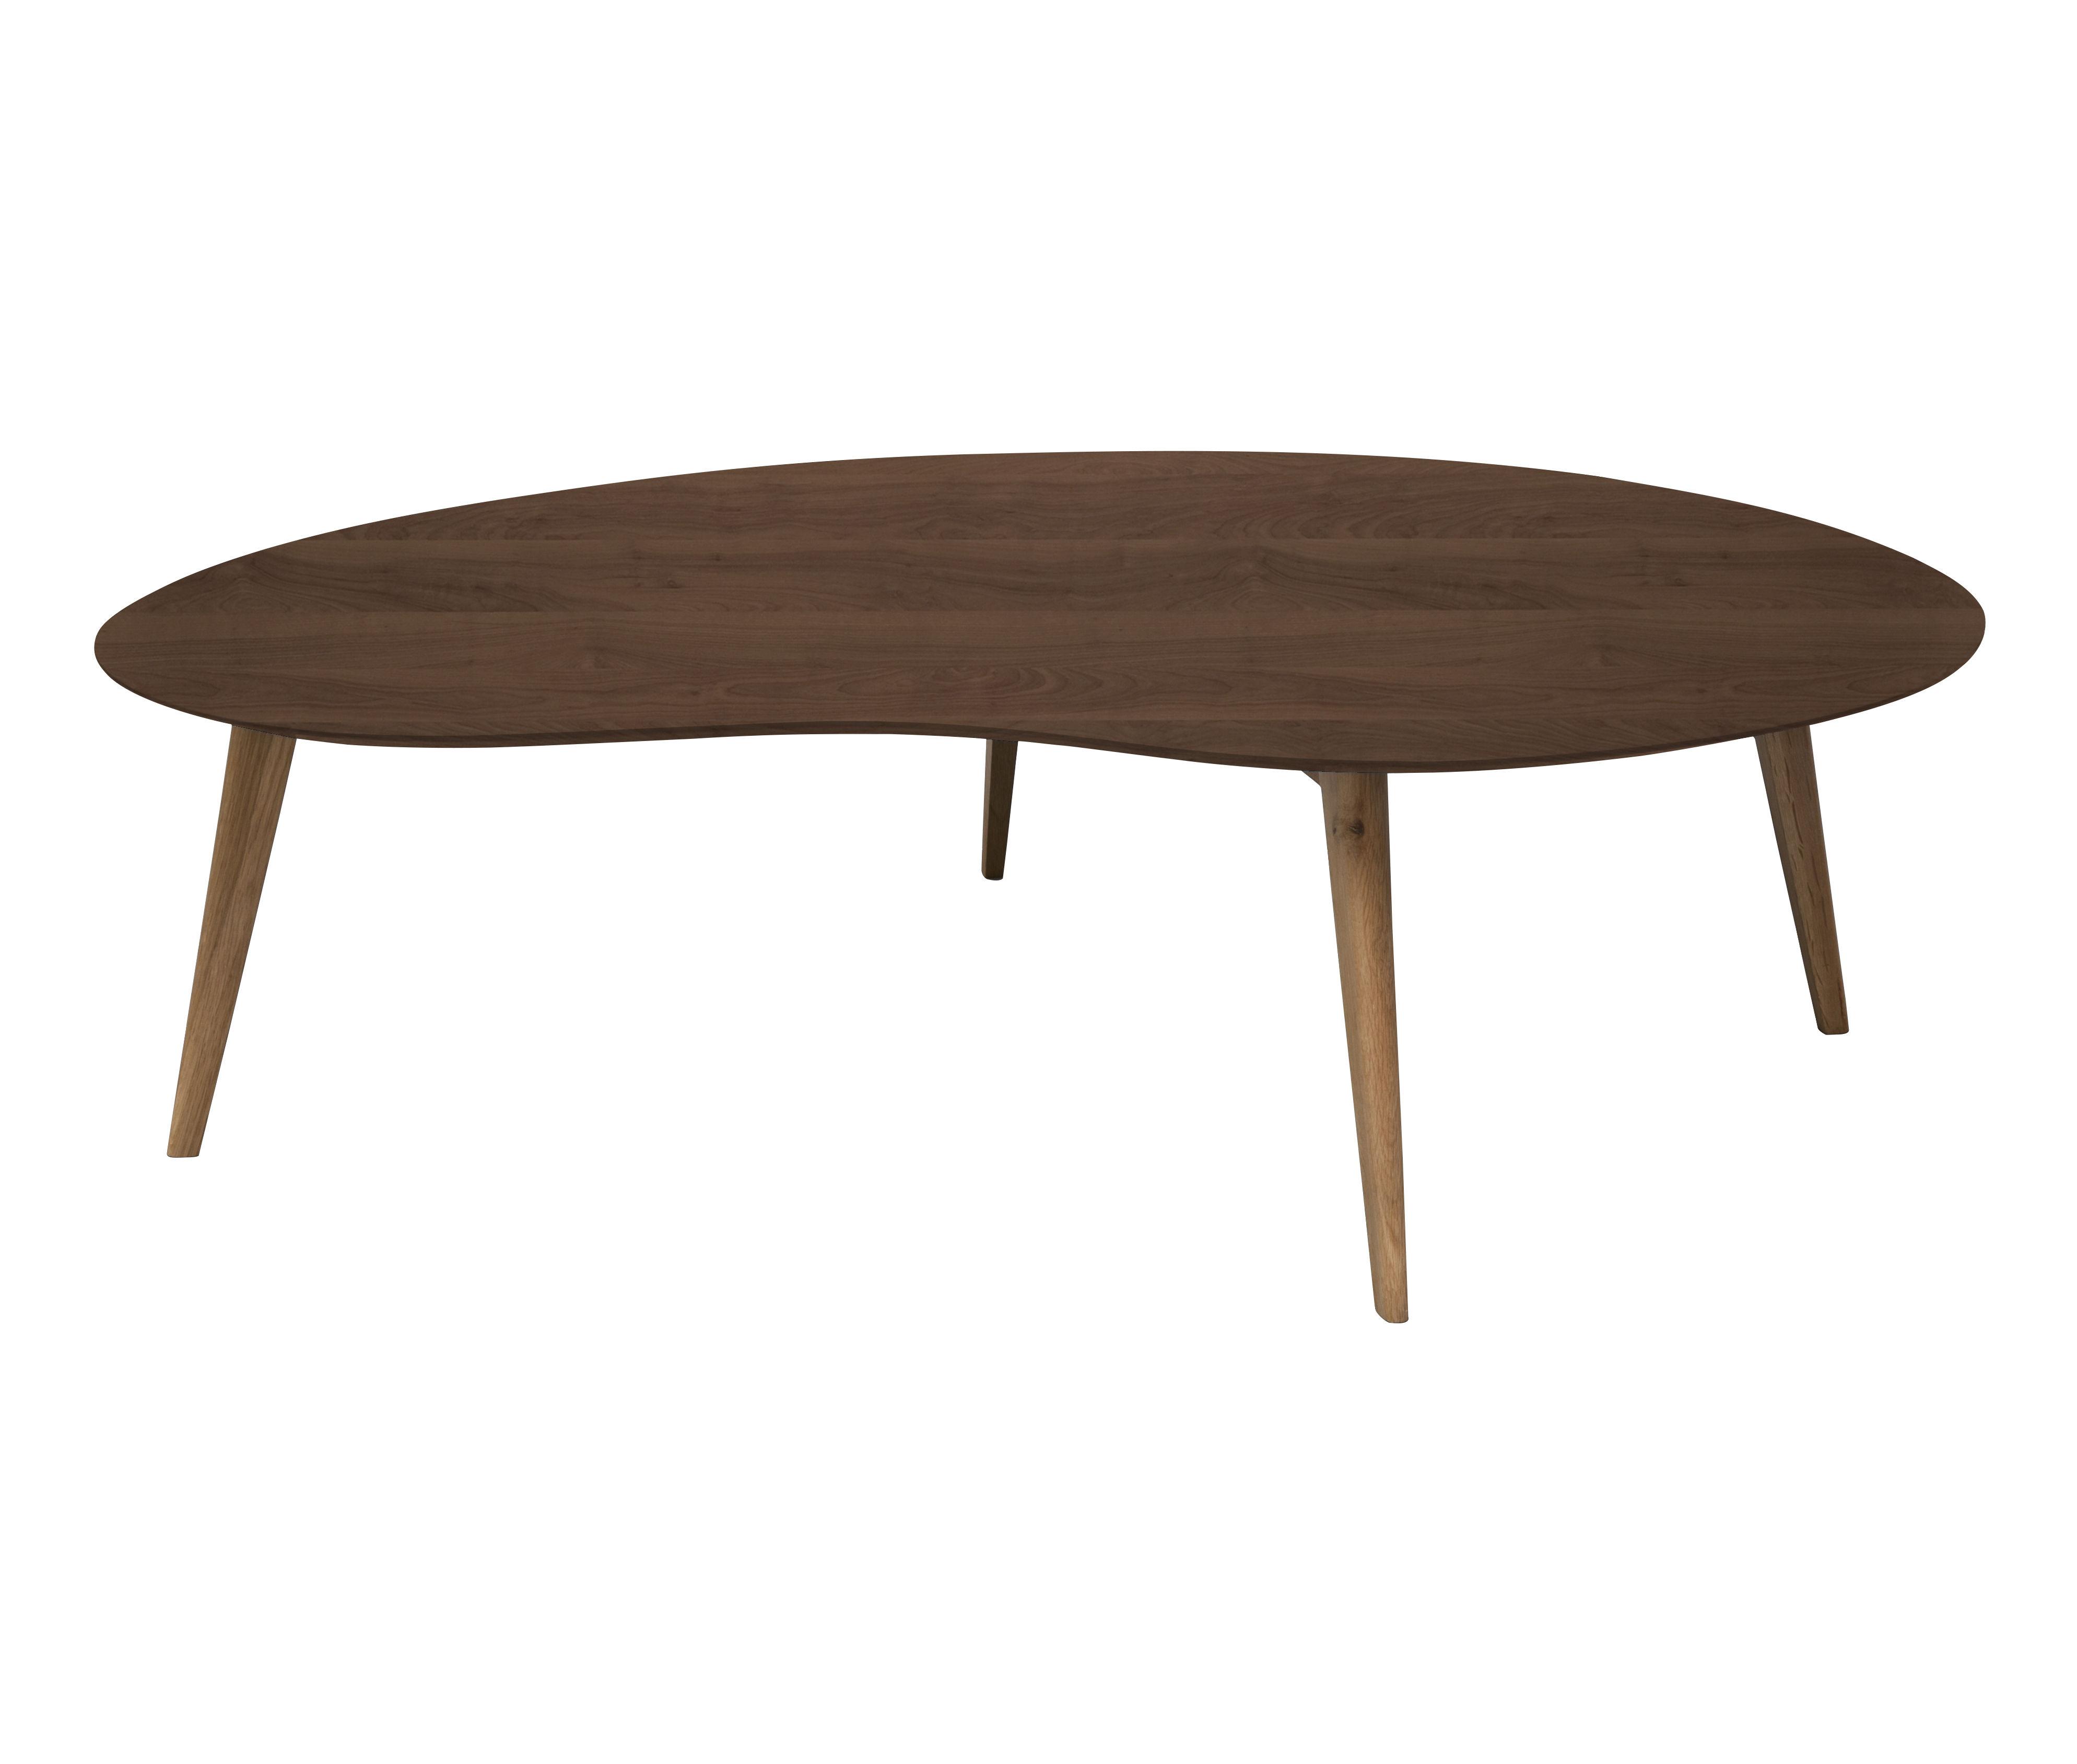 table basse lalinde haricot xxl l 130 cm noyer pieds noyer sentou edition. Black Bedroom Furniture Sets. Home Design Ideas